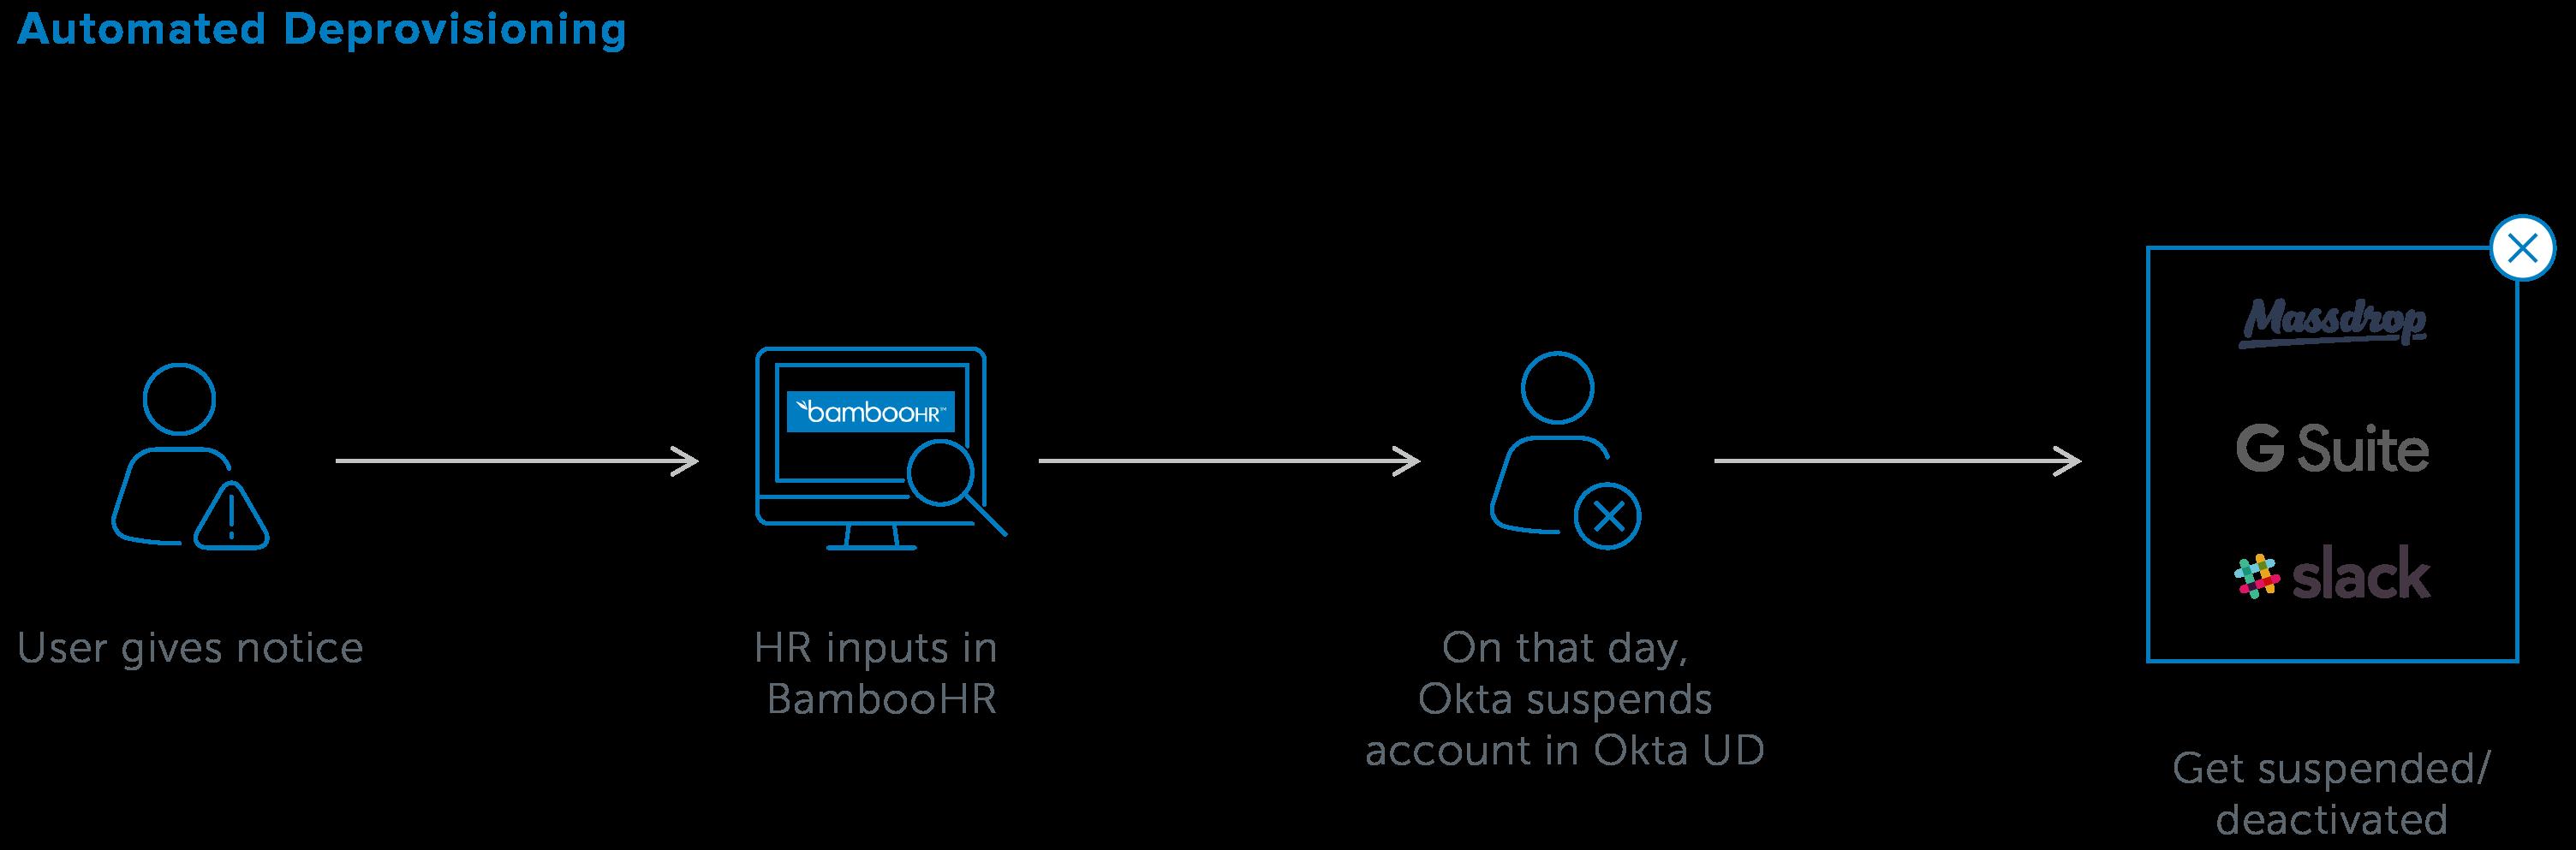 OKTA Massdrop workflows 20161221 3